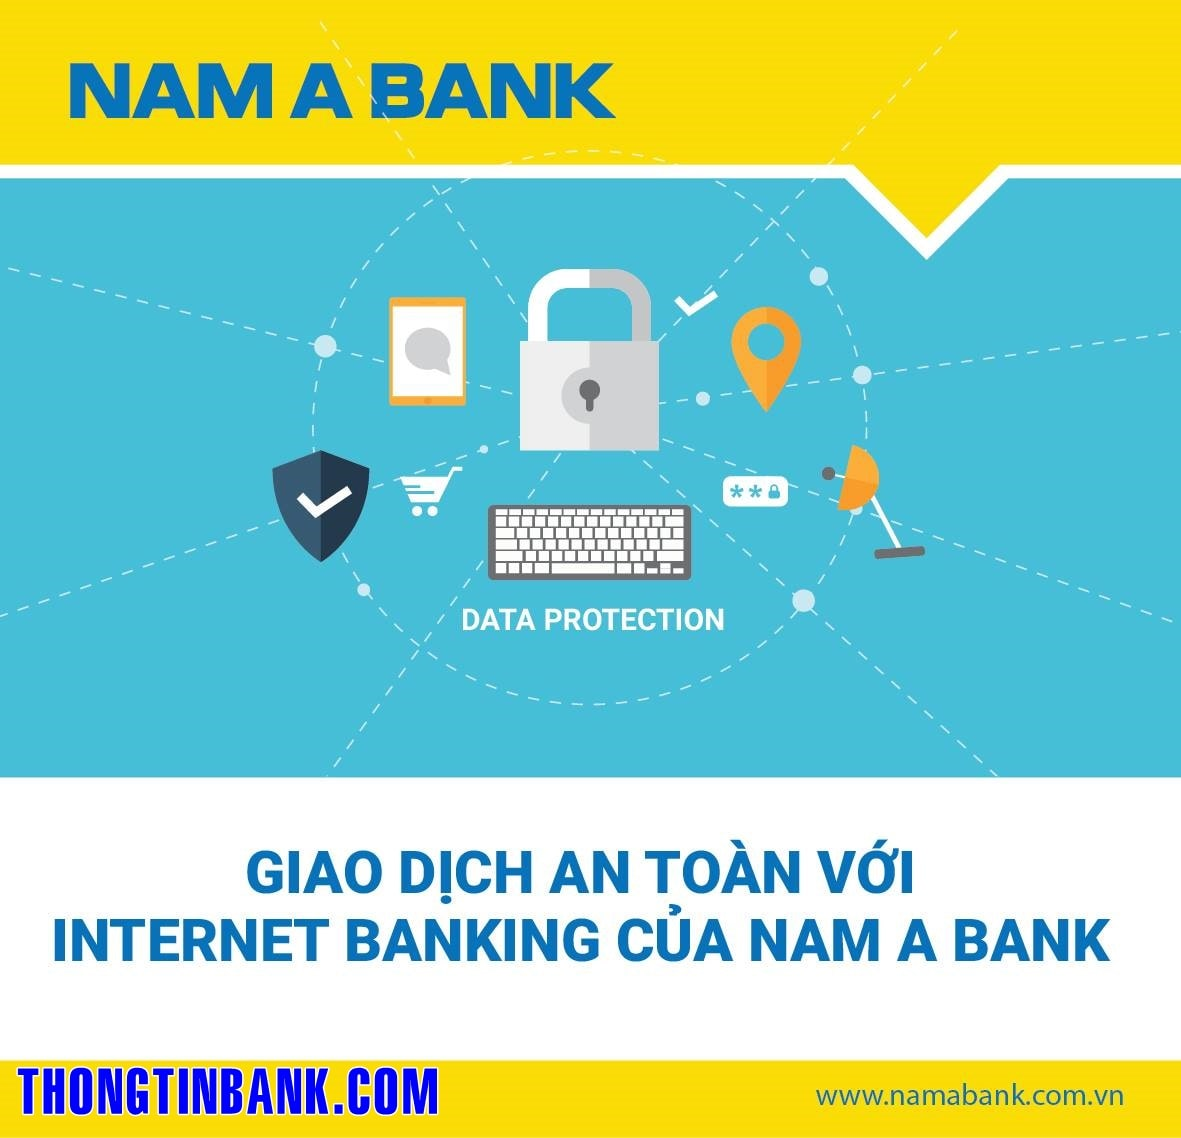 quen-so-tai-khoan-nam-a-bank-1